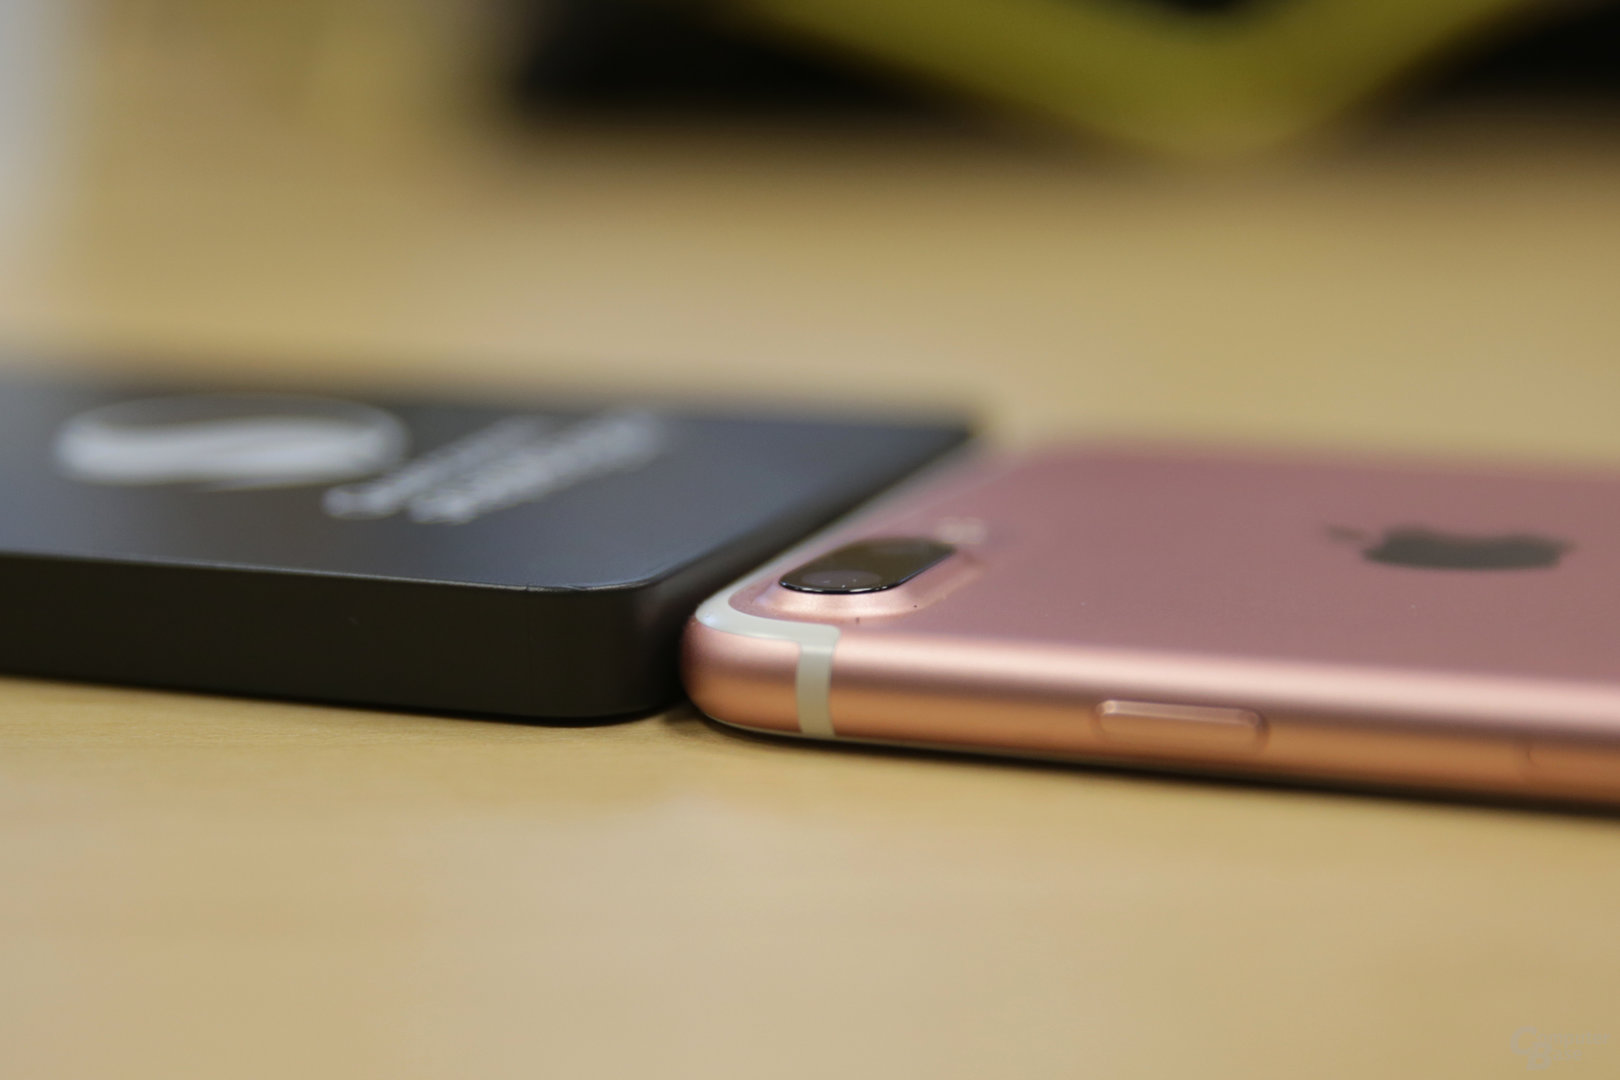 Die Snapdragon 835 QRD ist kaum dicker